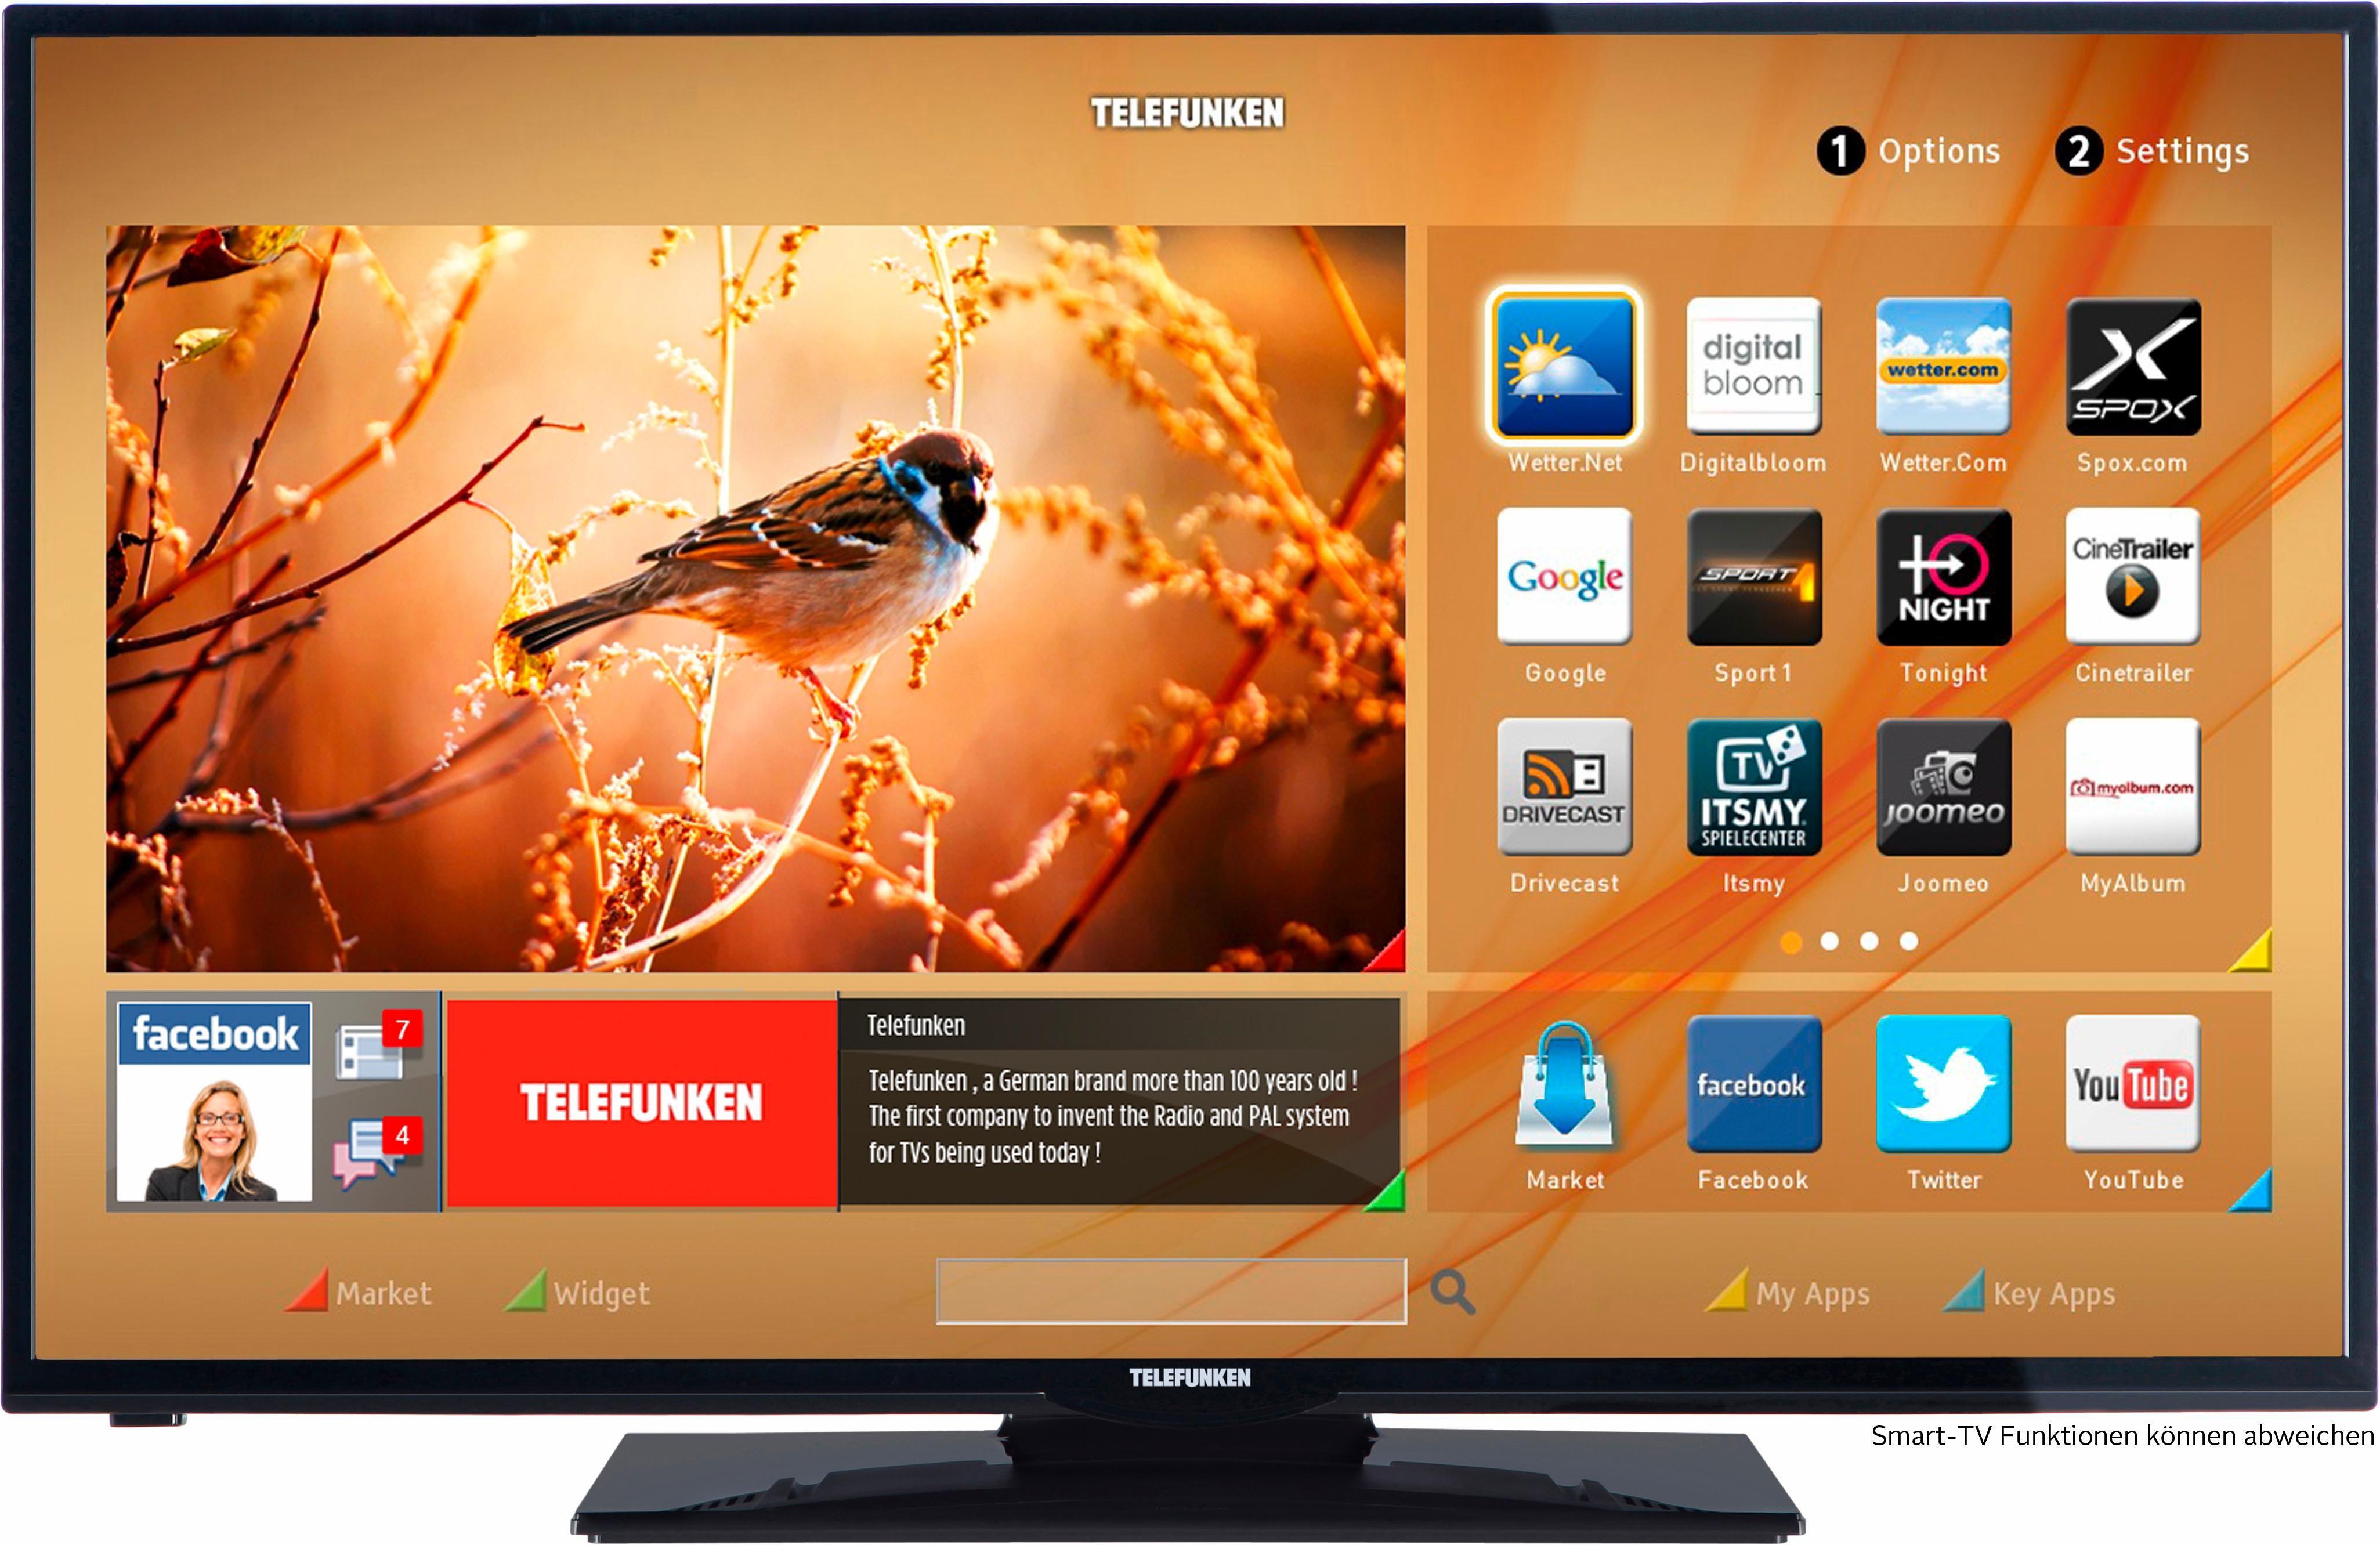 Telefunken D39F275M3CW, LED Fernseher, 99 cm (39 Zoll), 1080p (Full HD), Smart-TV